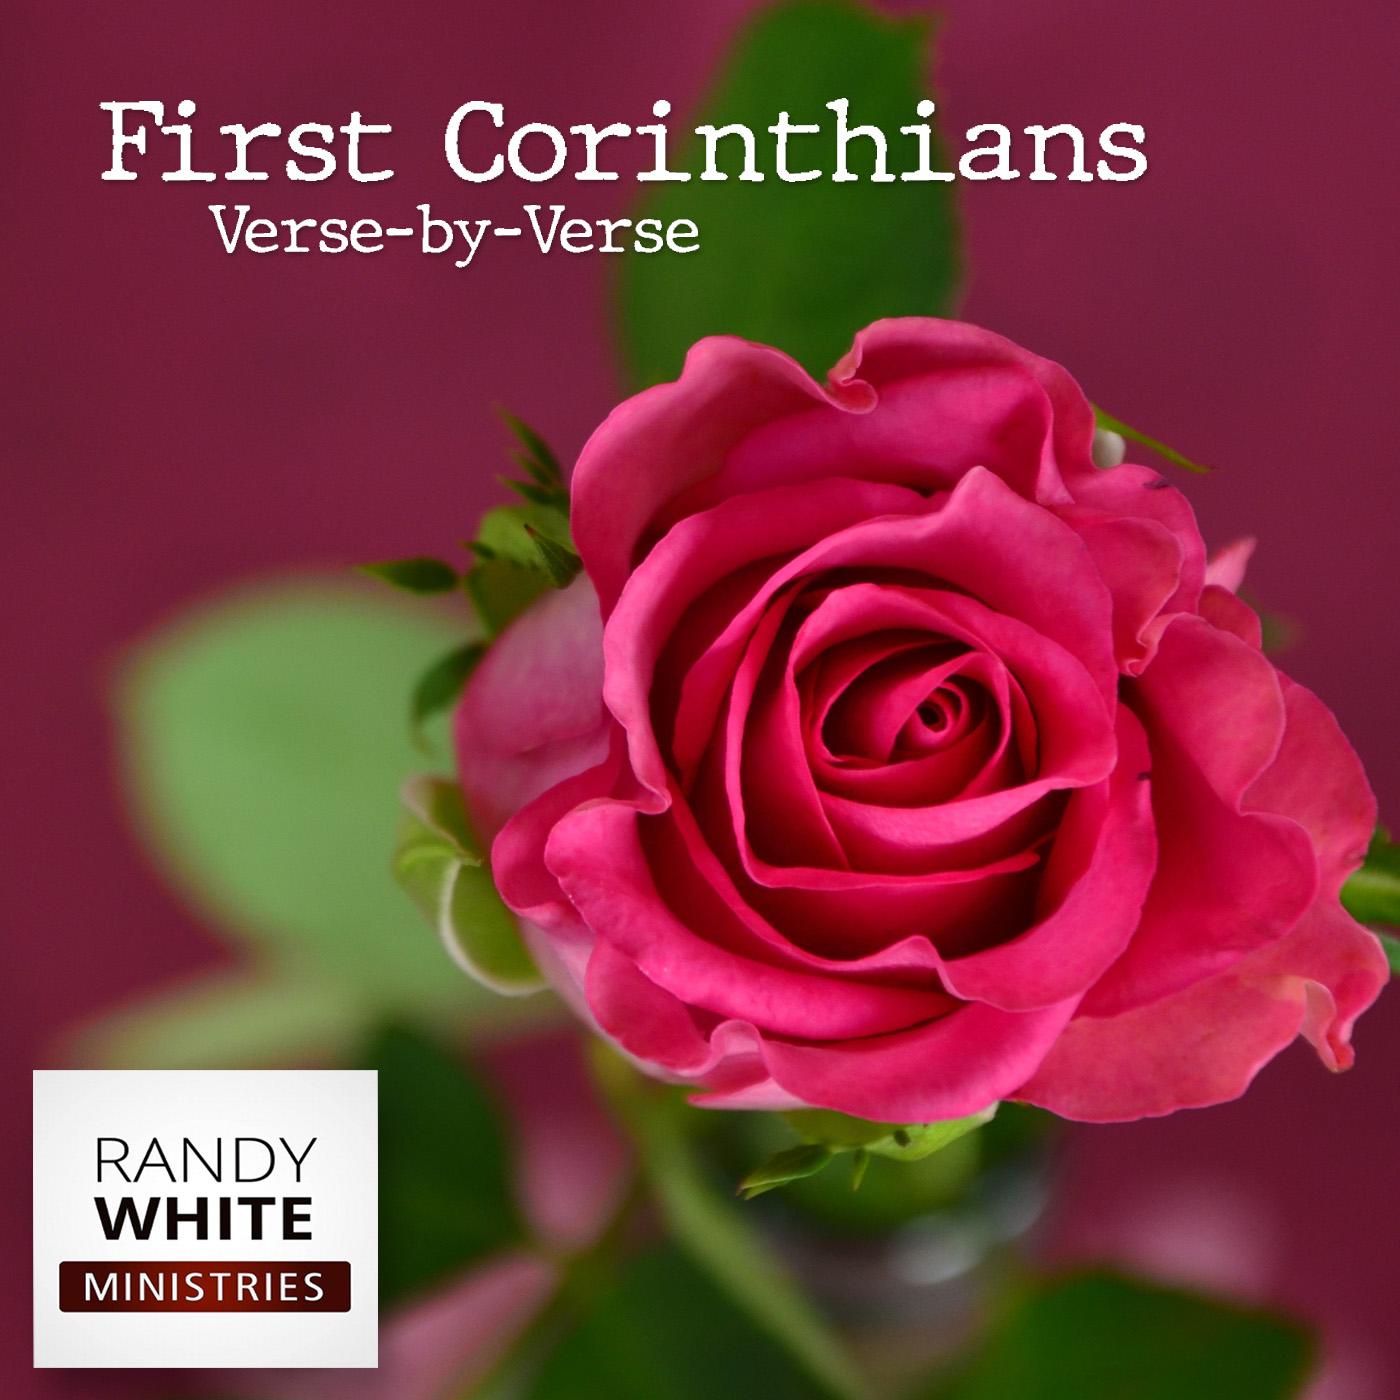 RWM: First Corinthians Verse-by-Verse